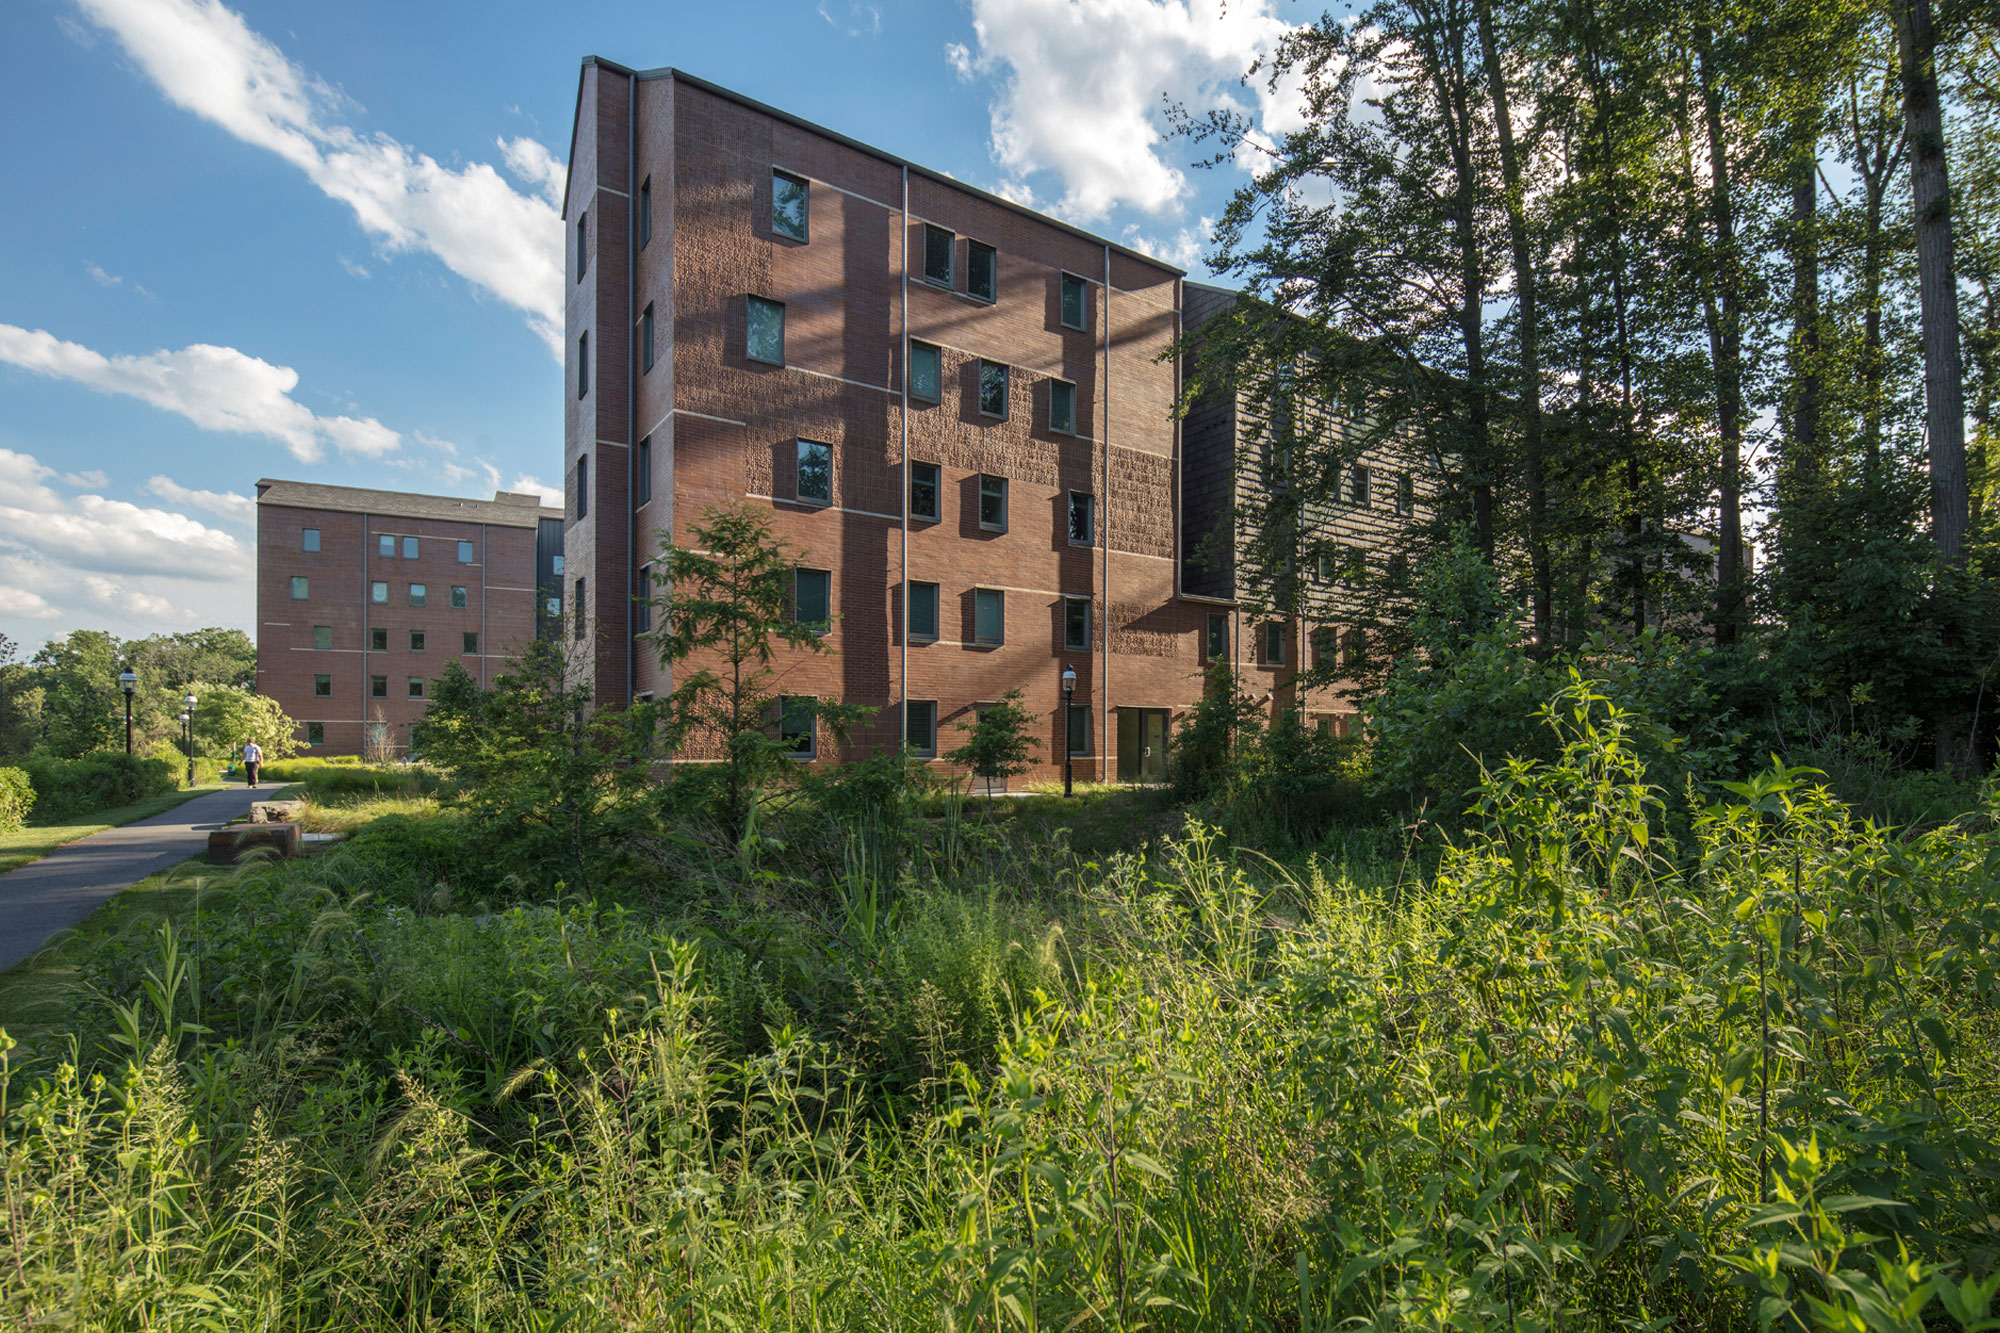 Princeton University Lakeside Graduate Housing Architect Magazine